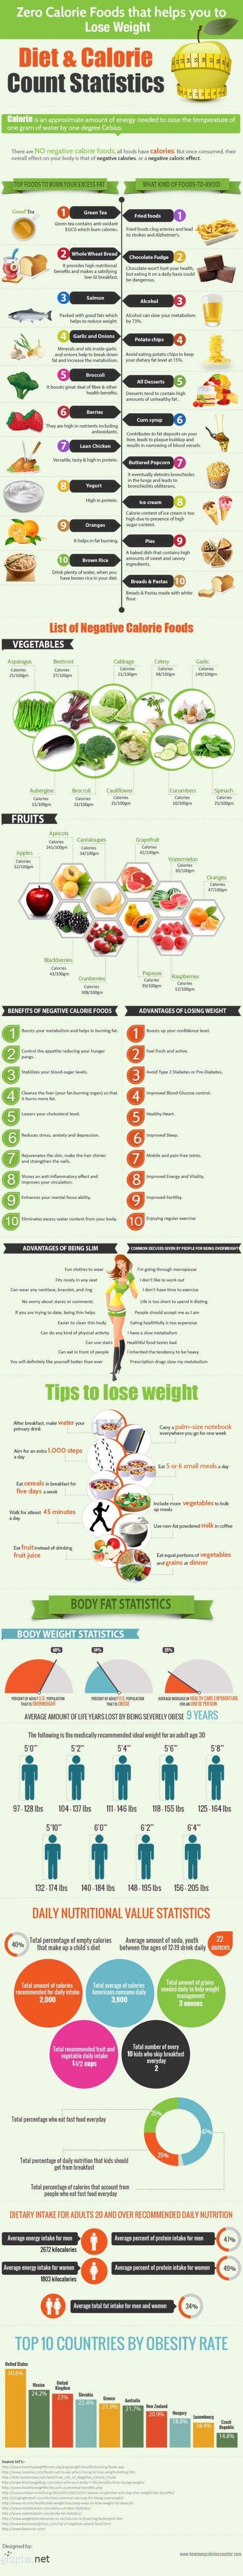 Zero calorie foods that helps you to lose weight (Bezkaloricke potraviny, ktere vam pomohou zhubnout - infografika)